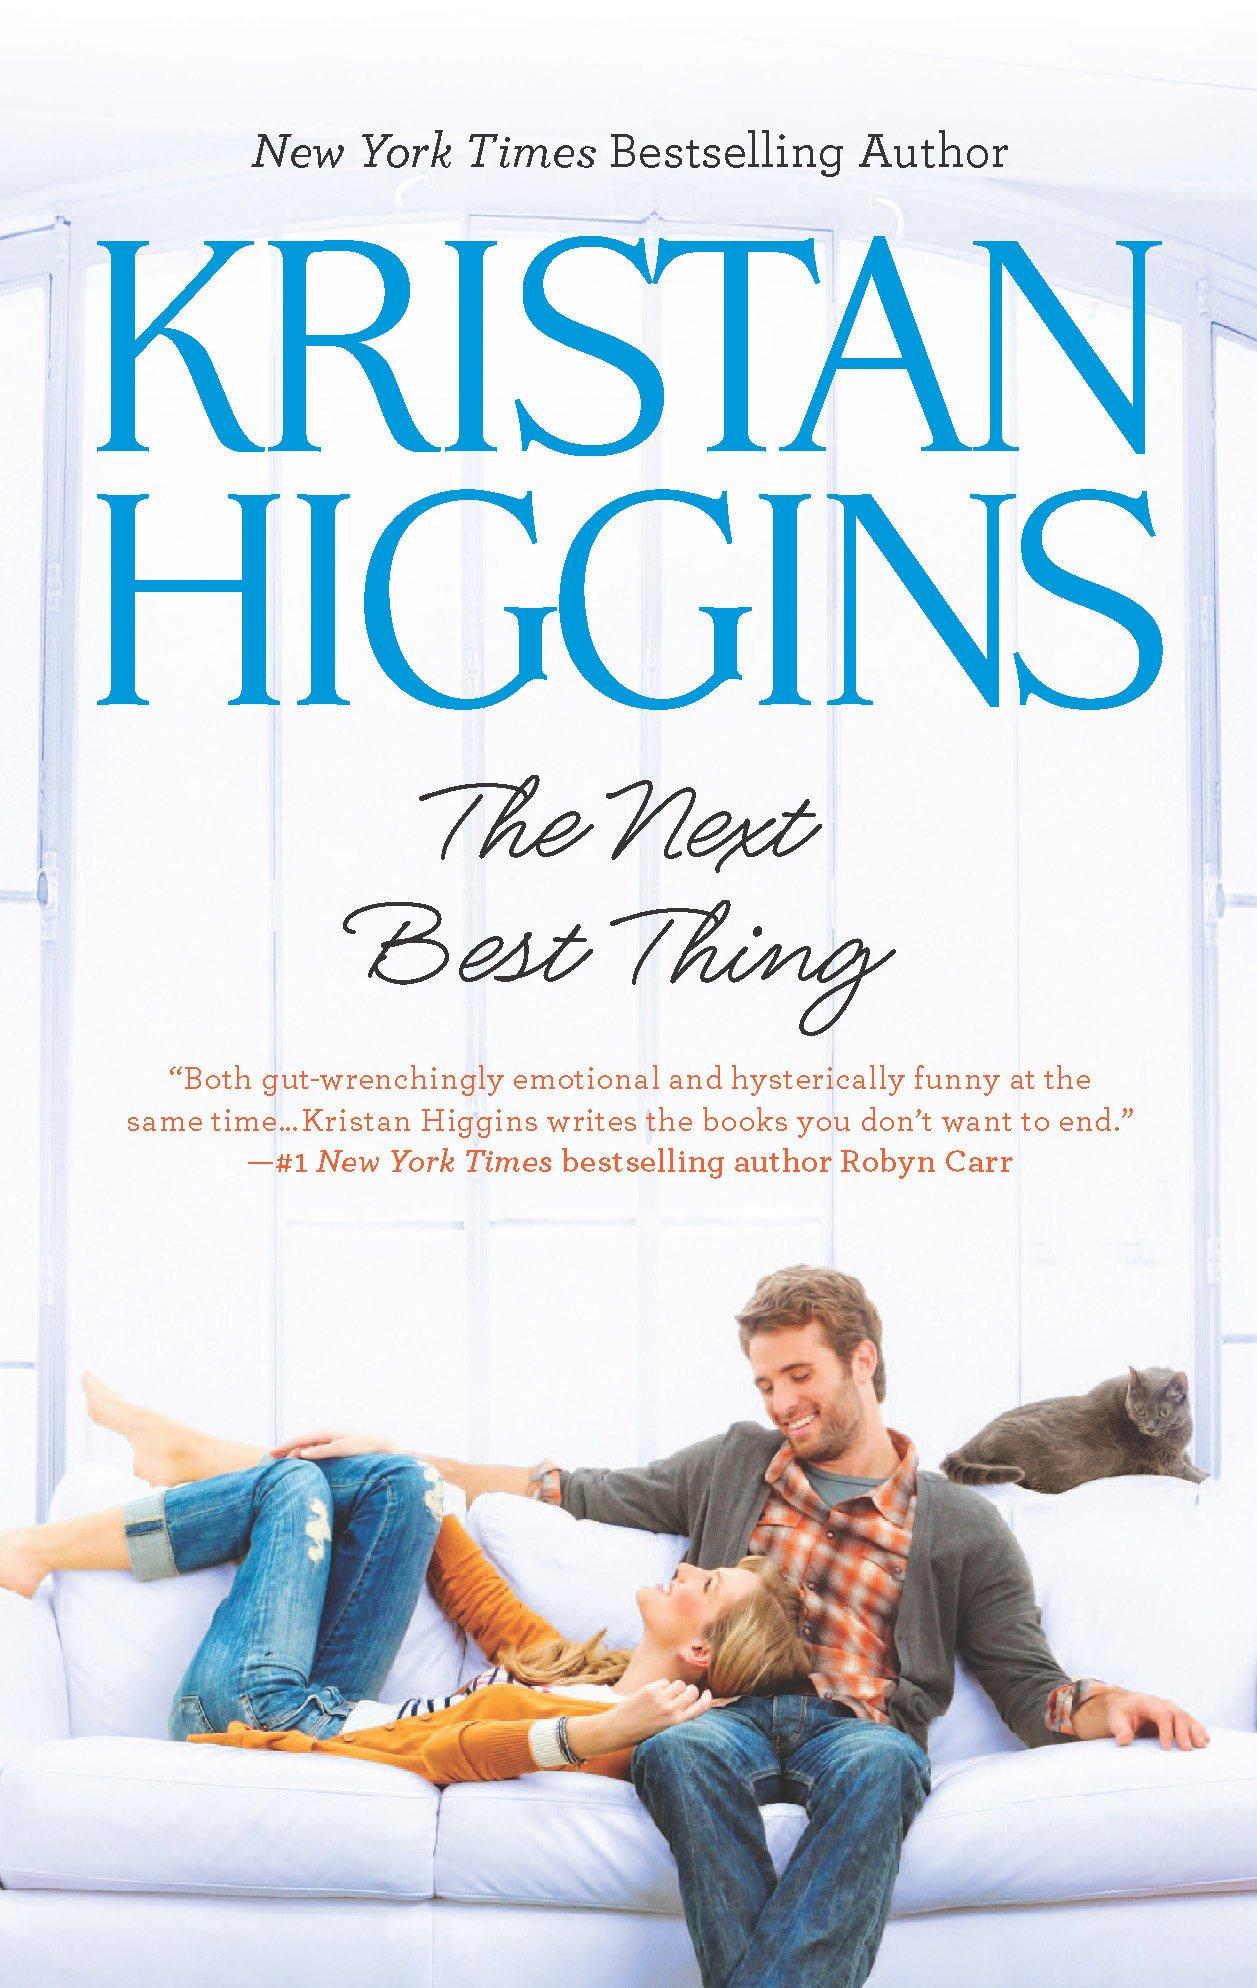 The Next Best Thing: Higgins, Kristan: 9780373777341: Amazon.com: Books